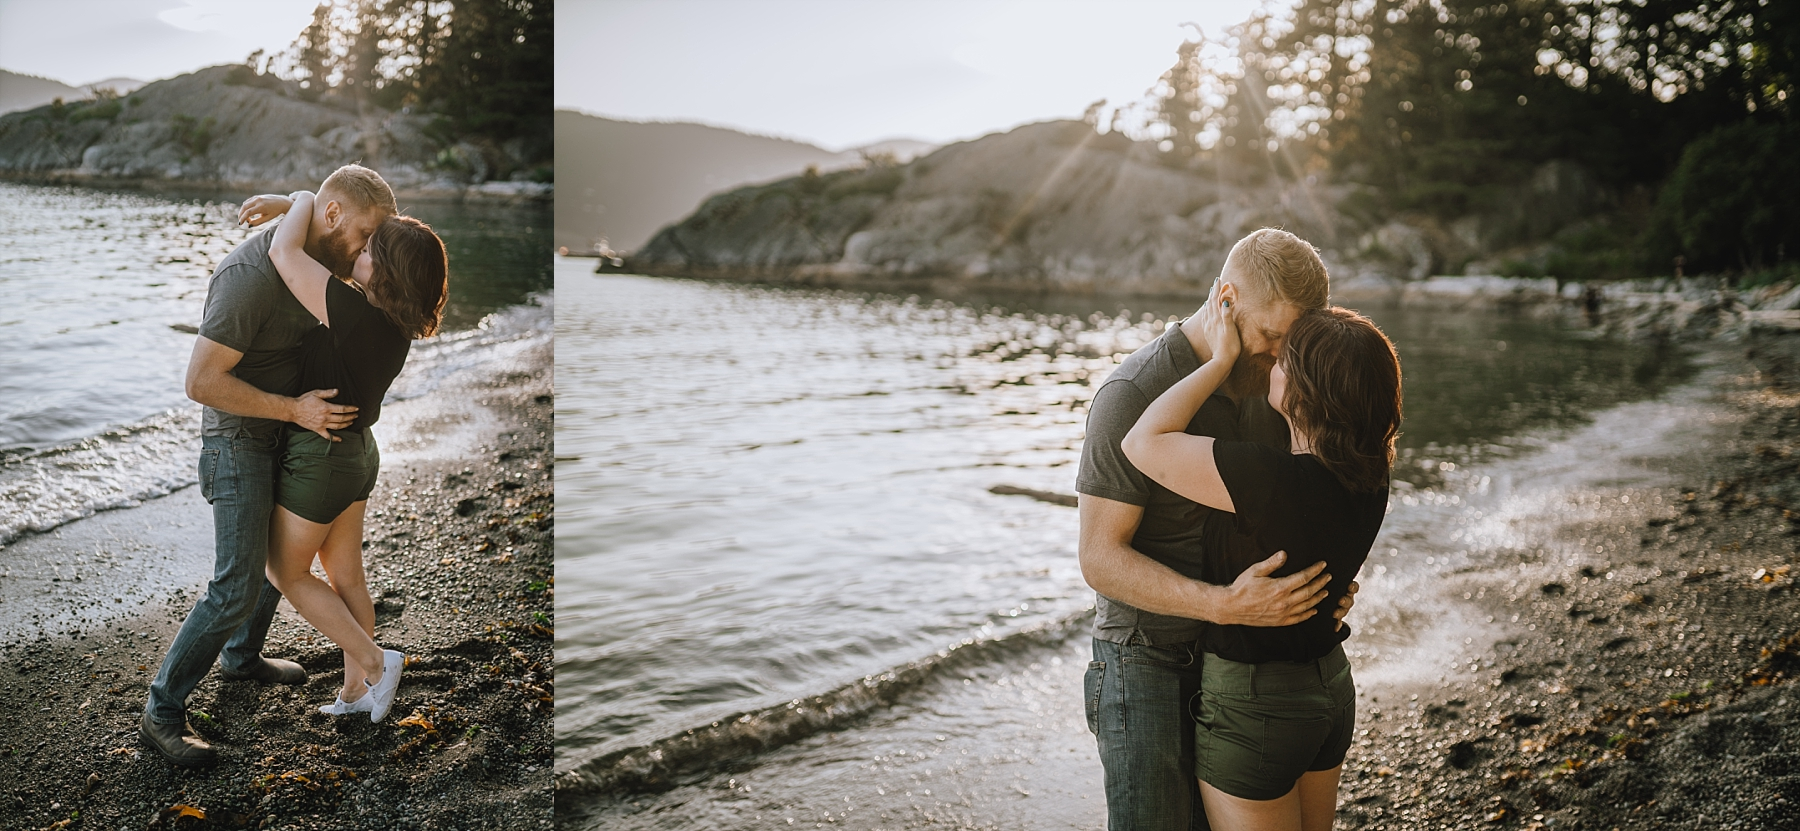 whytecliff park engagement photoshoot